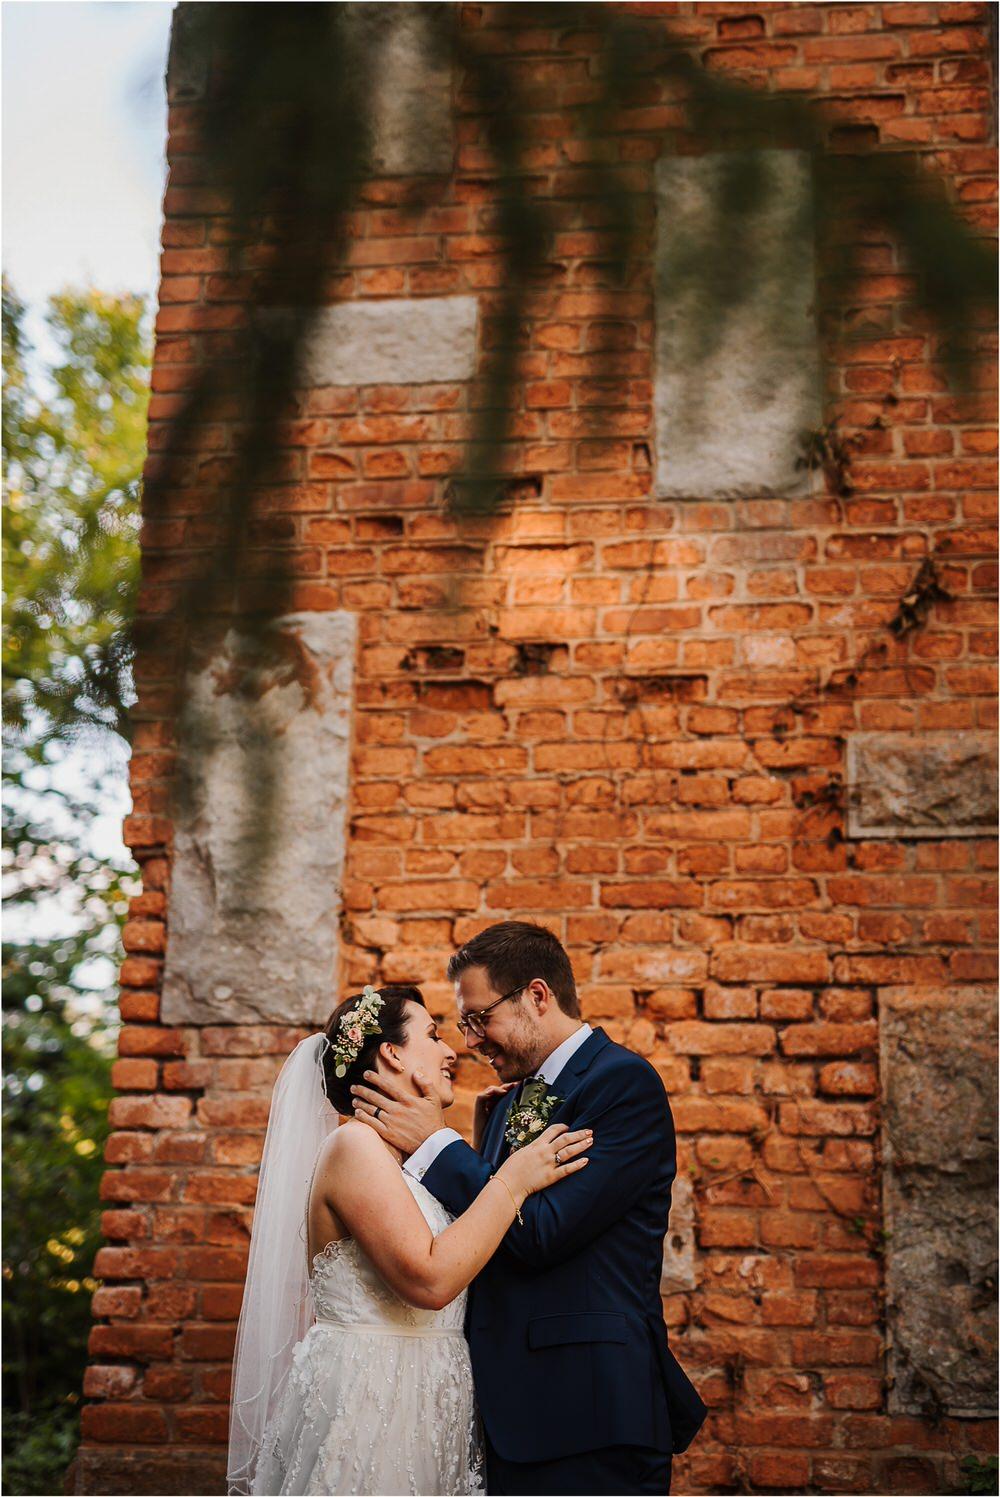 lake bled slovenia wedding vila bled sanjski sopek bled castle ceremony outdoor romantic wedding photographer photography natural candid bright 0116.jpg